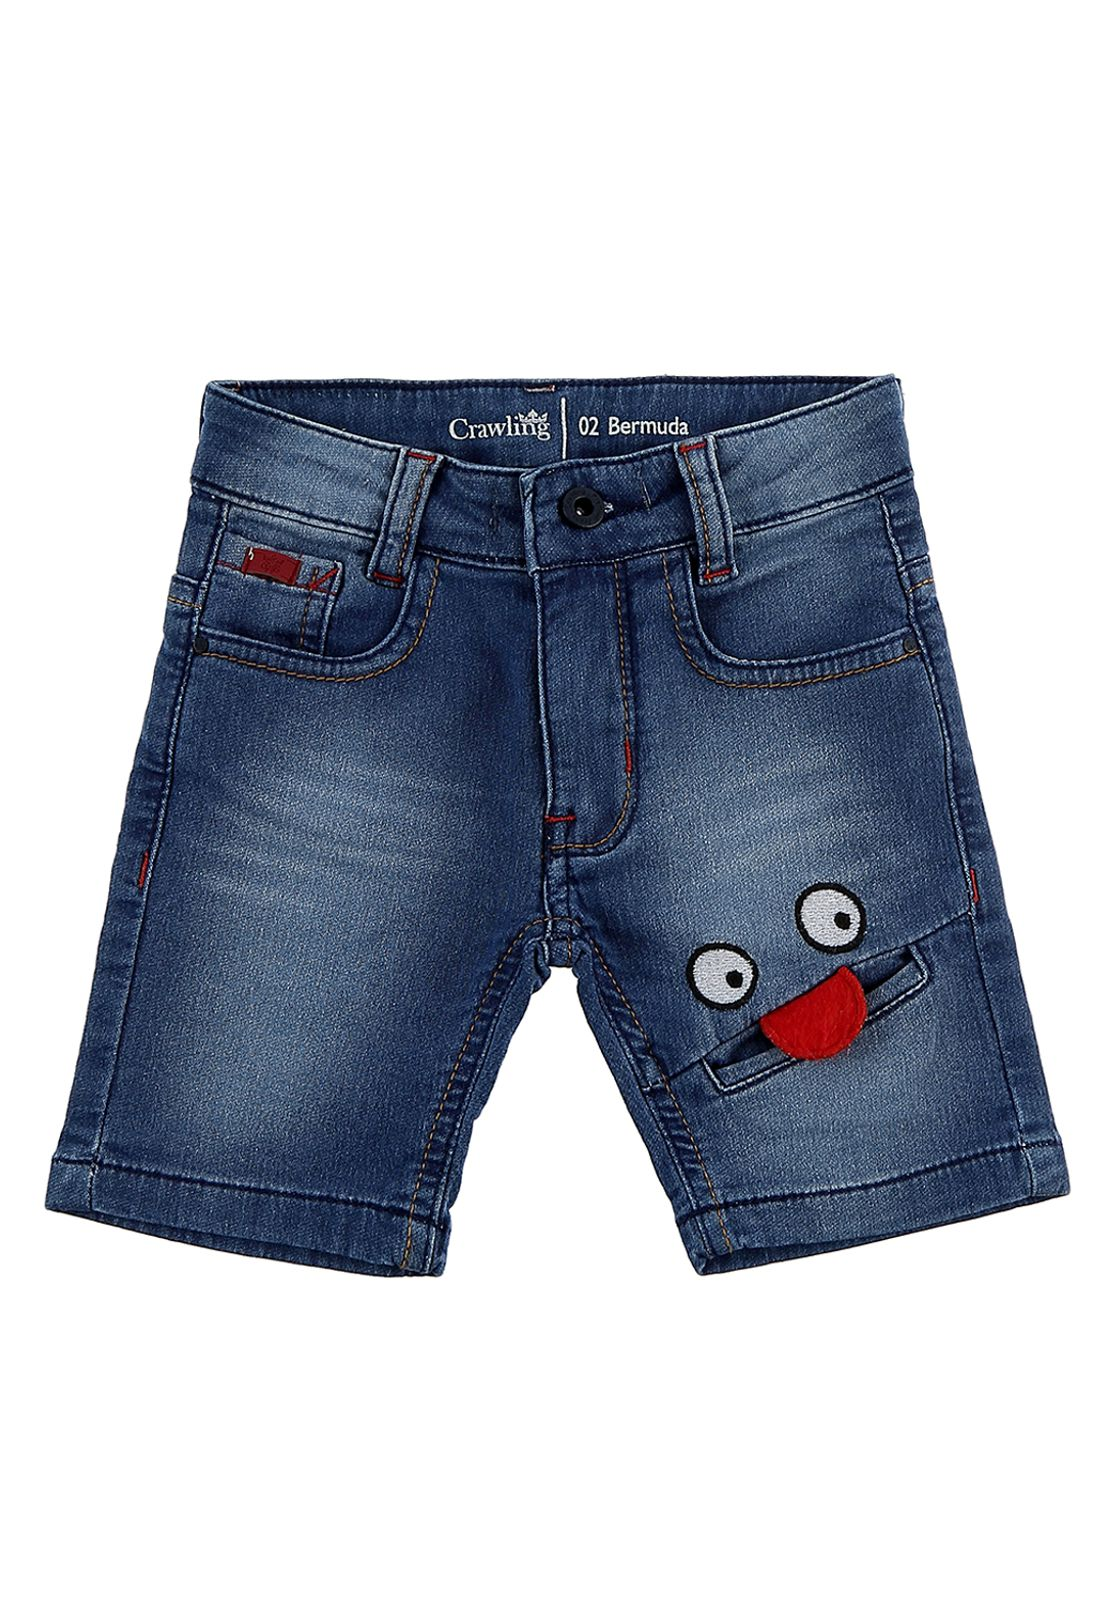 Bermuda Masculina Moletom Crawling Jeans